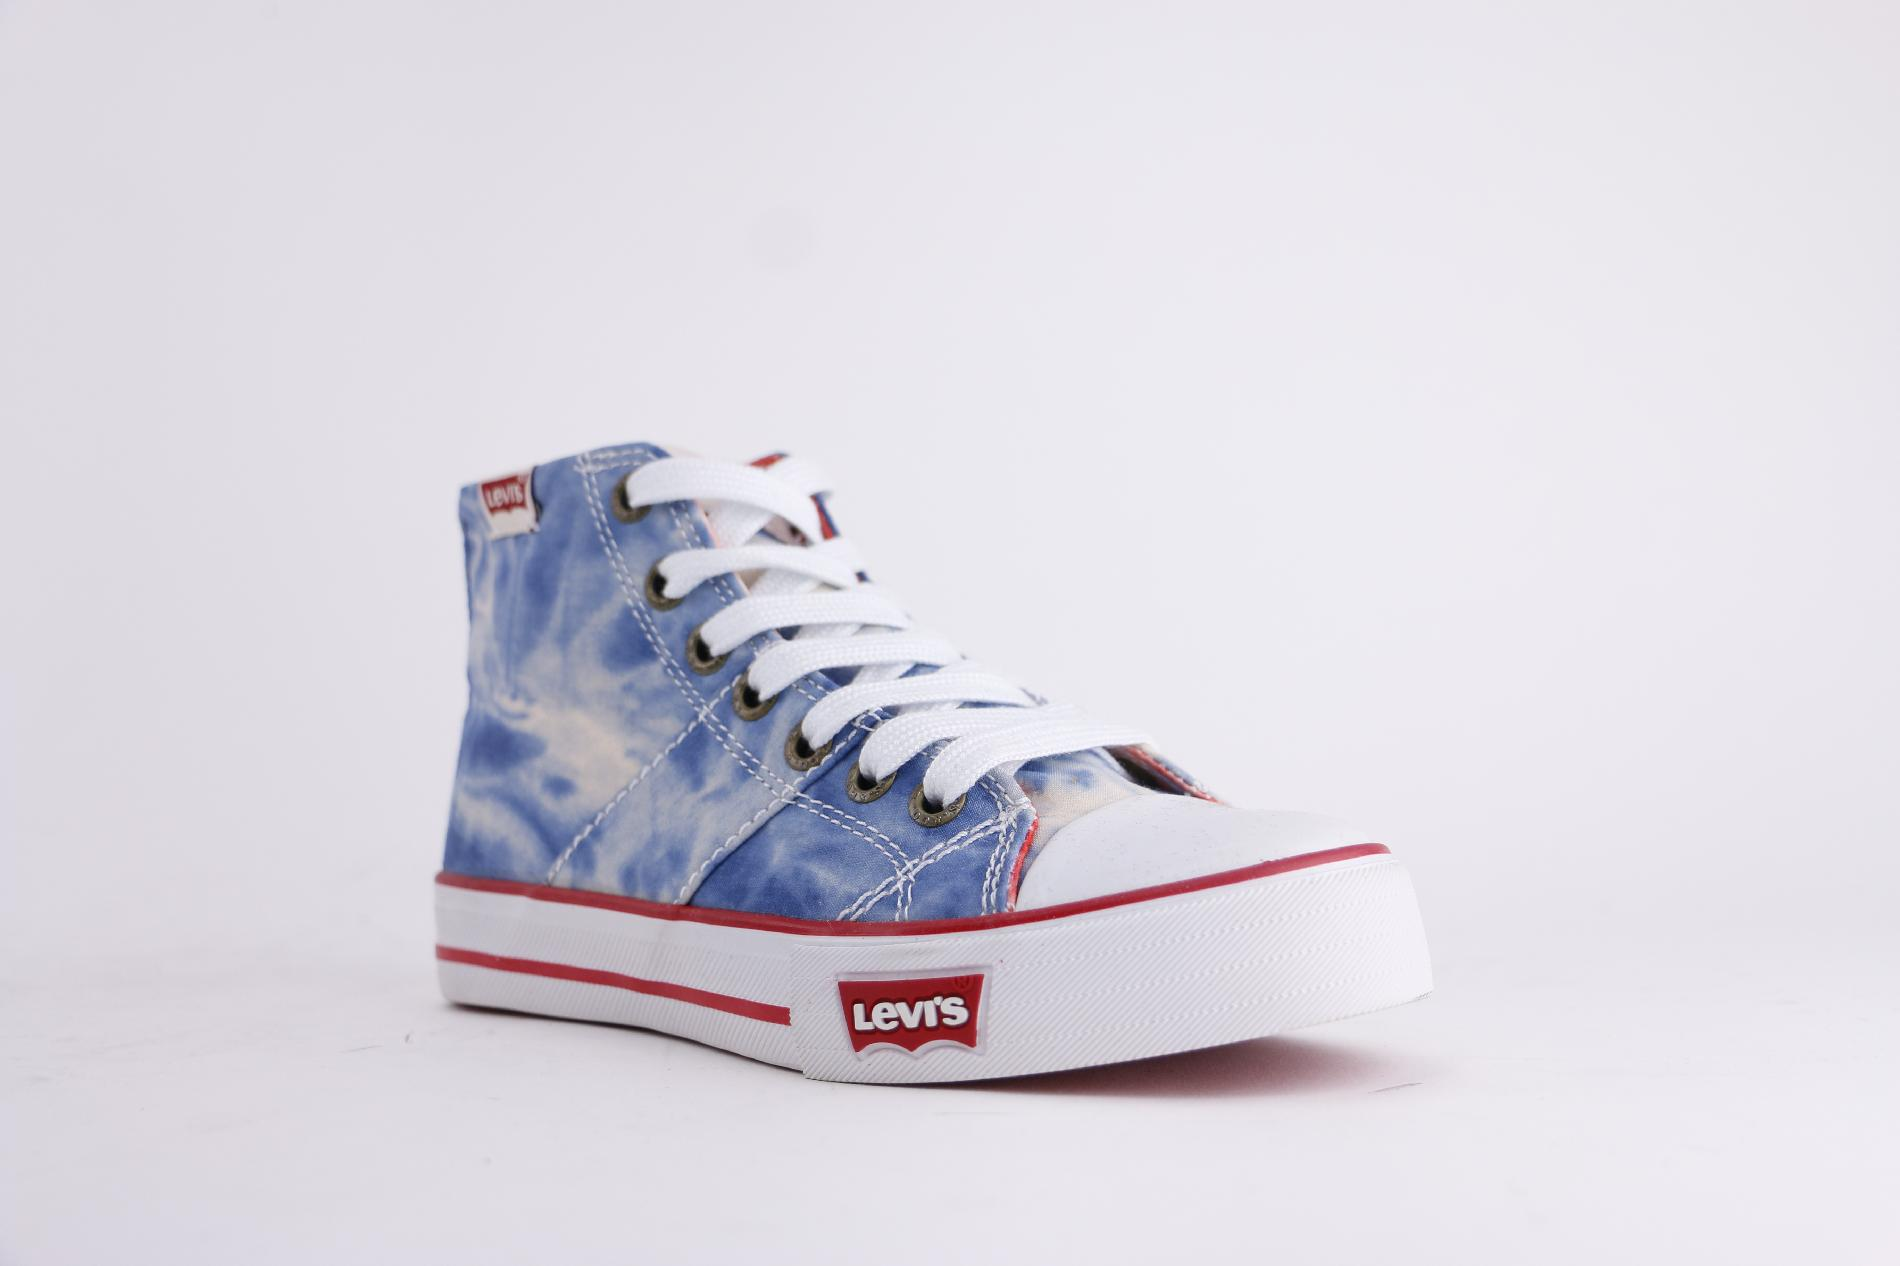 Levi's Toddler Boy's Hamilton Tie Dye Blue Sneaker